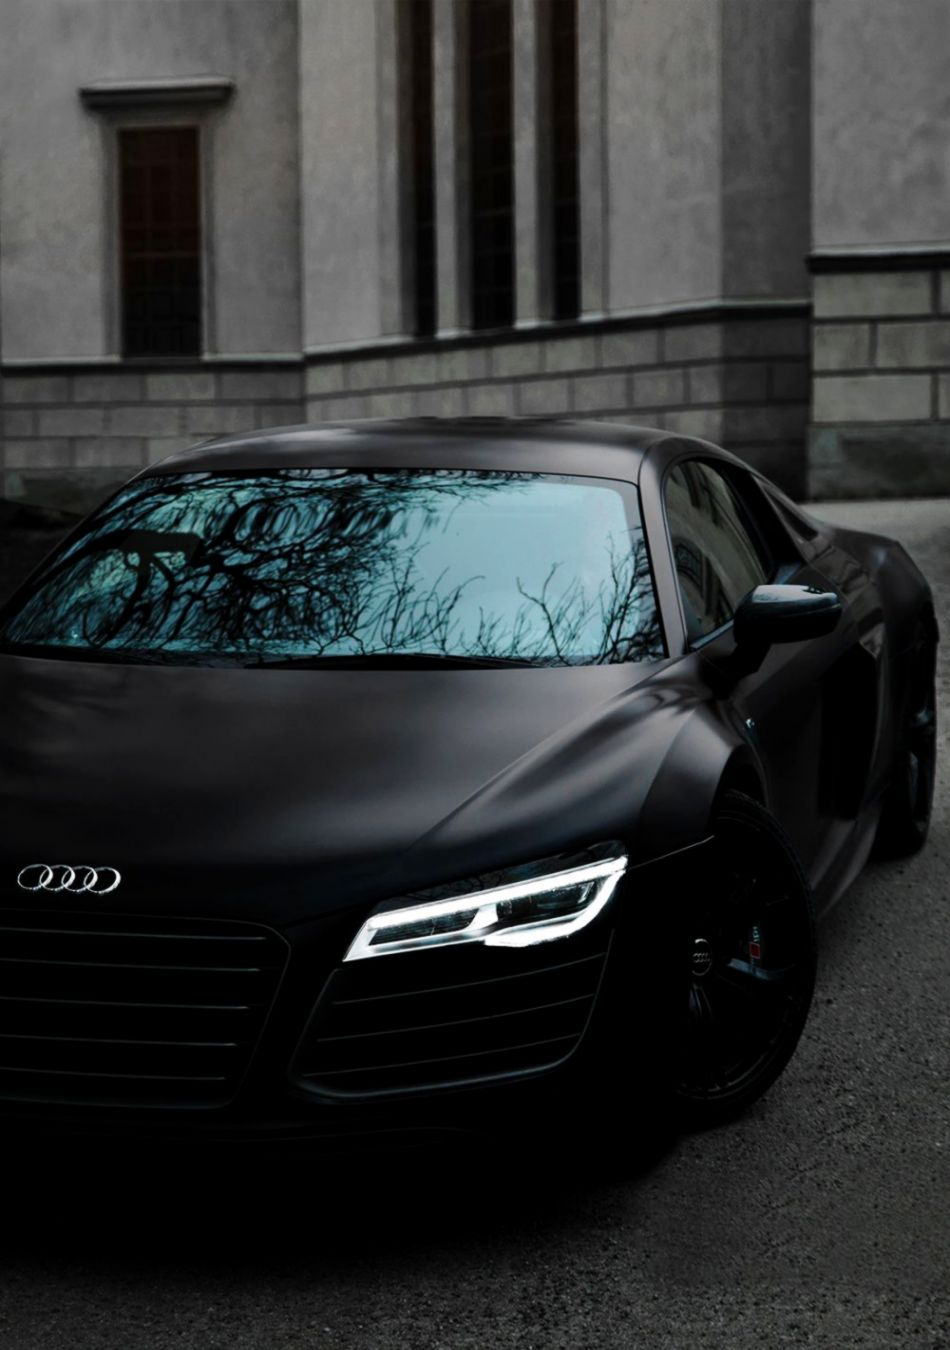 Audi R8 Black Wallpaper Posted By Samantha Johnson